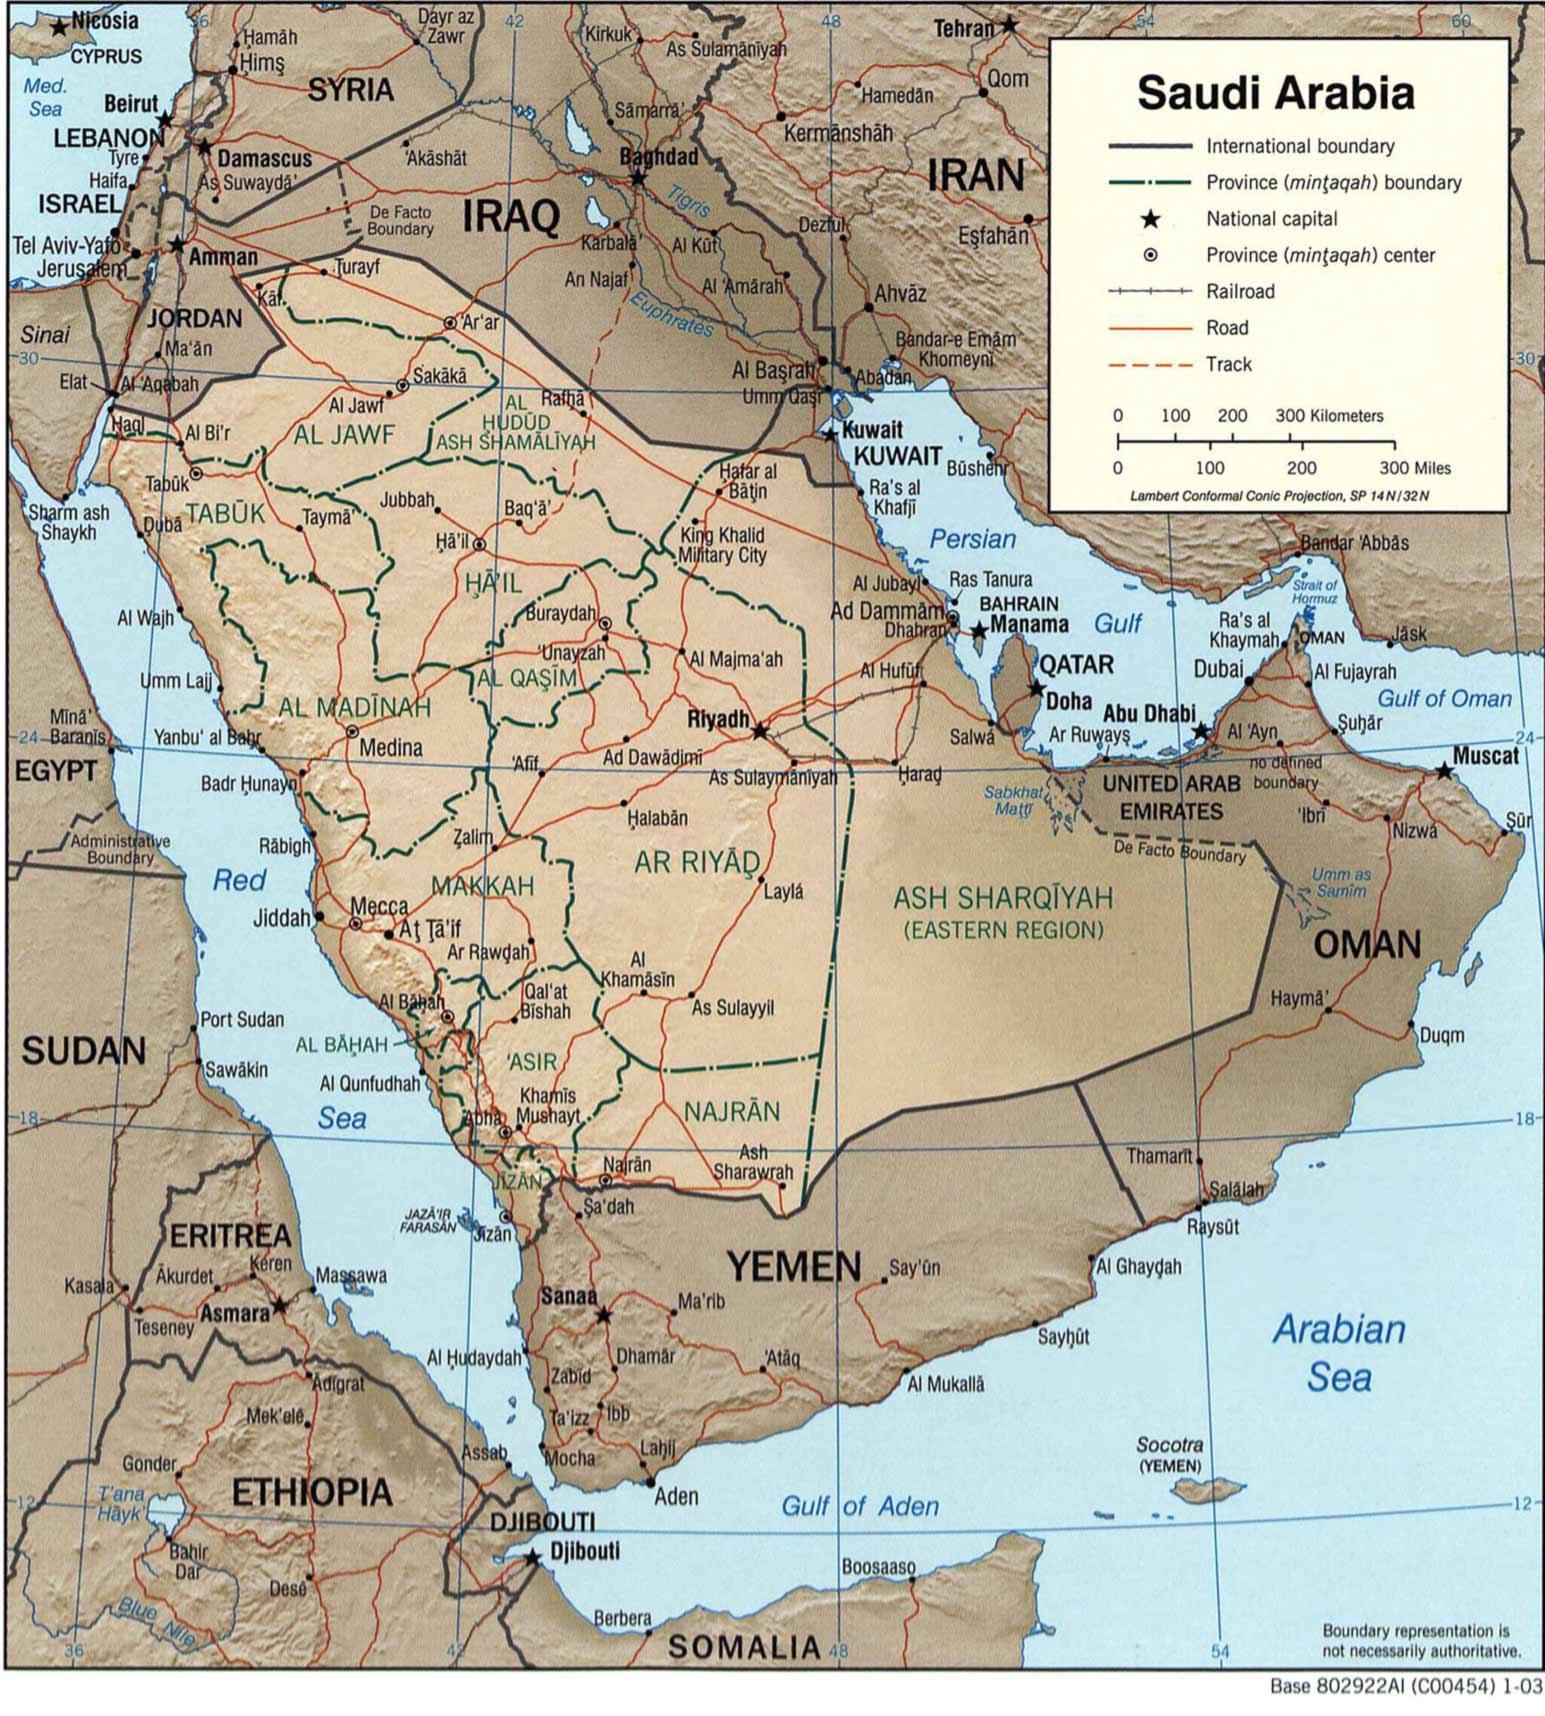 Carte Arabie saoudite, Carte de l'Arabie saoudite